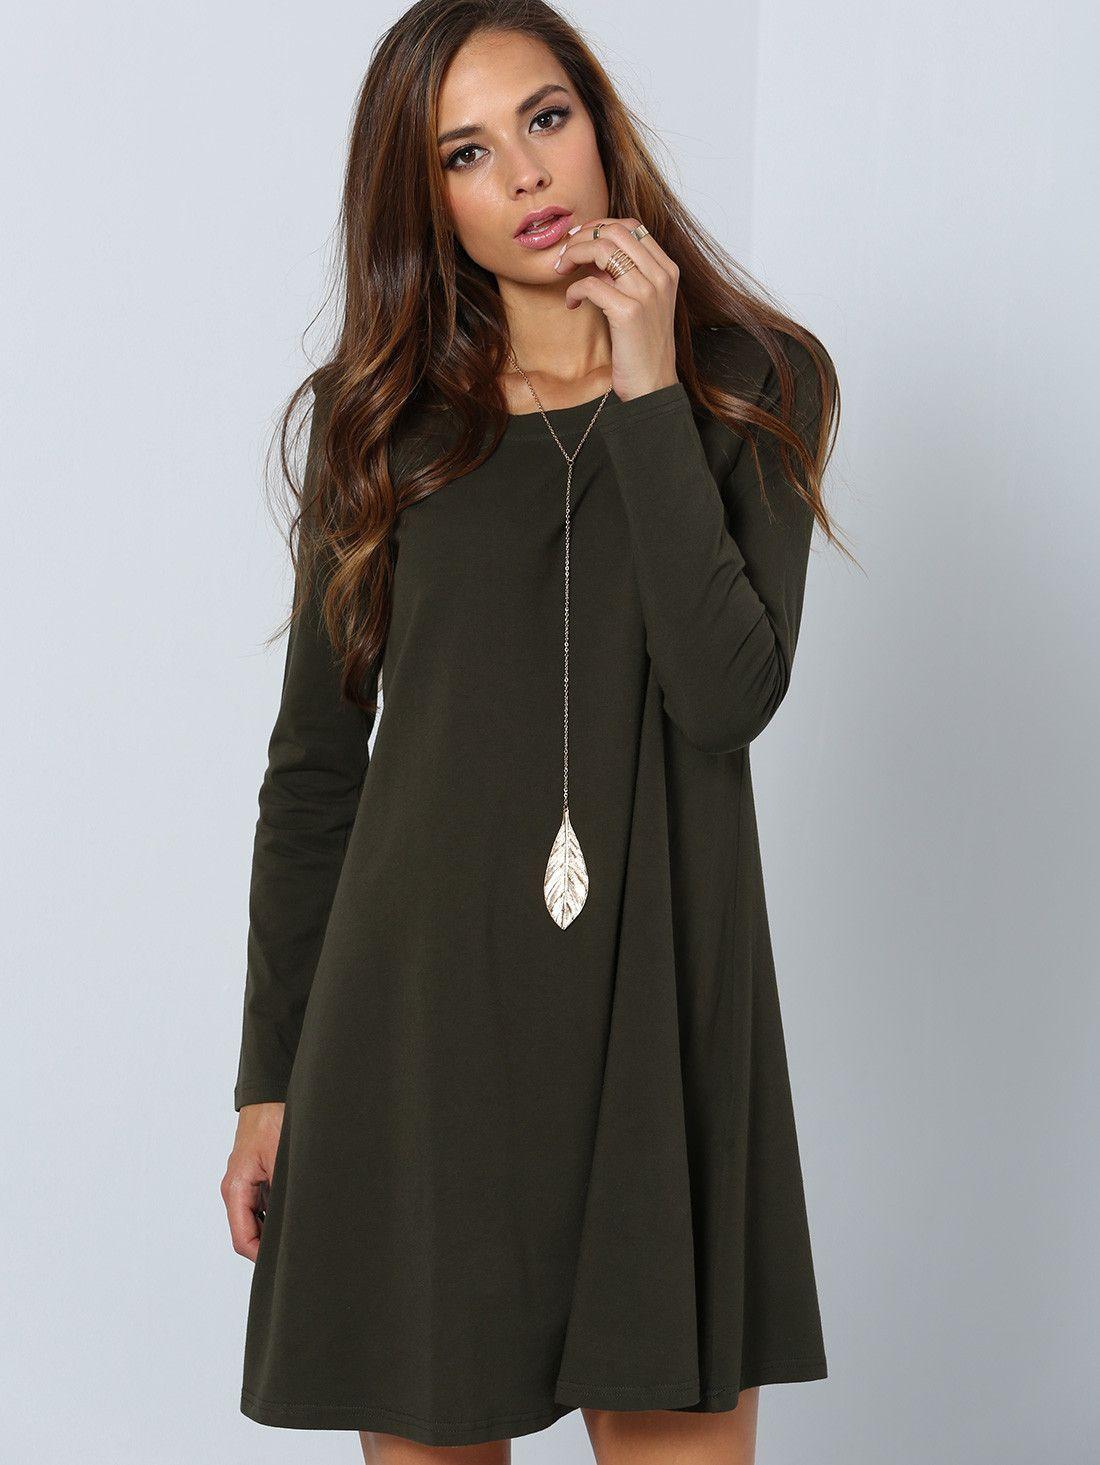 Long dark green dress  Dark Green Long Sleeve Designer Casual Dress  Moda Verano